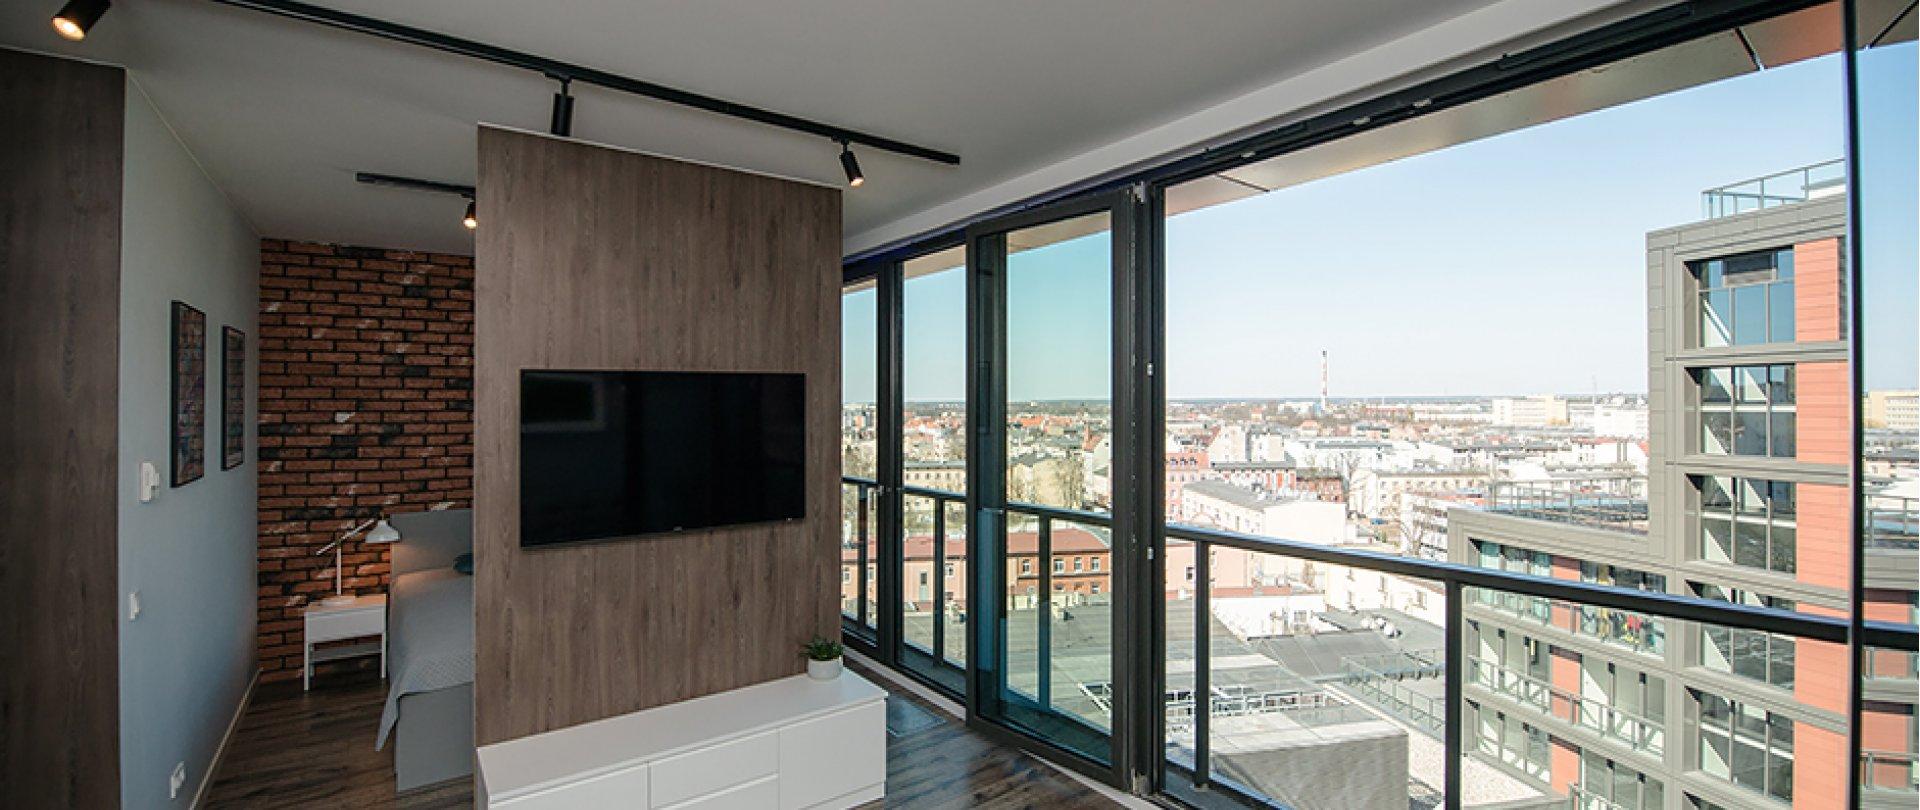 Nr 5. Apartament typu Studio 36m2